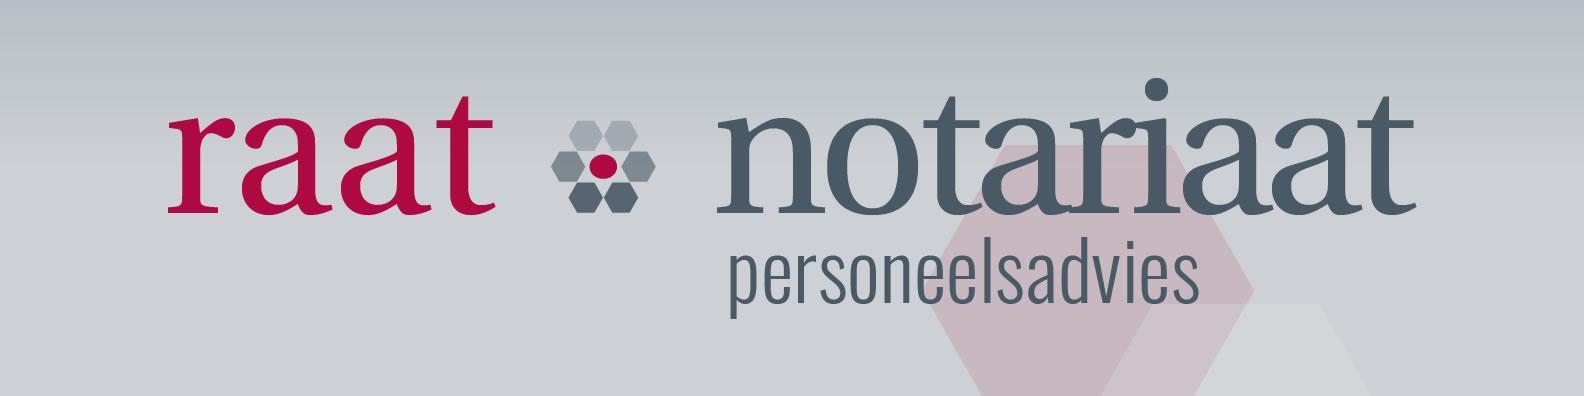 Medior of senior  kandidaat- notaris/ toegevoegd notaris (commercieel ) vastgoed 80 - 100%